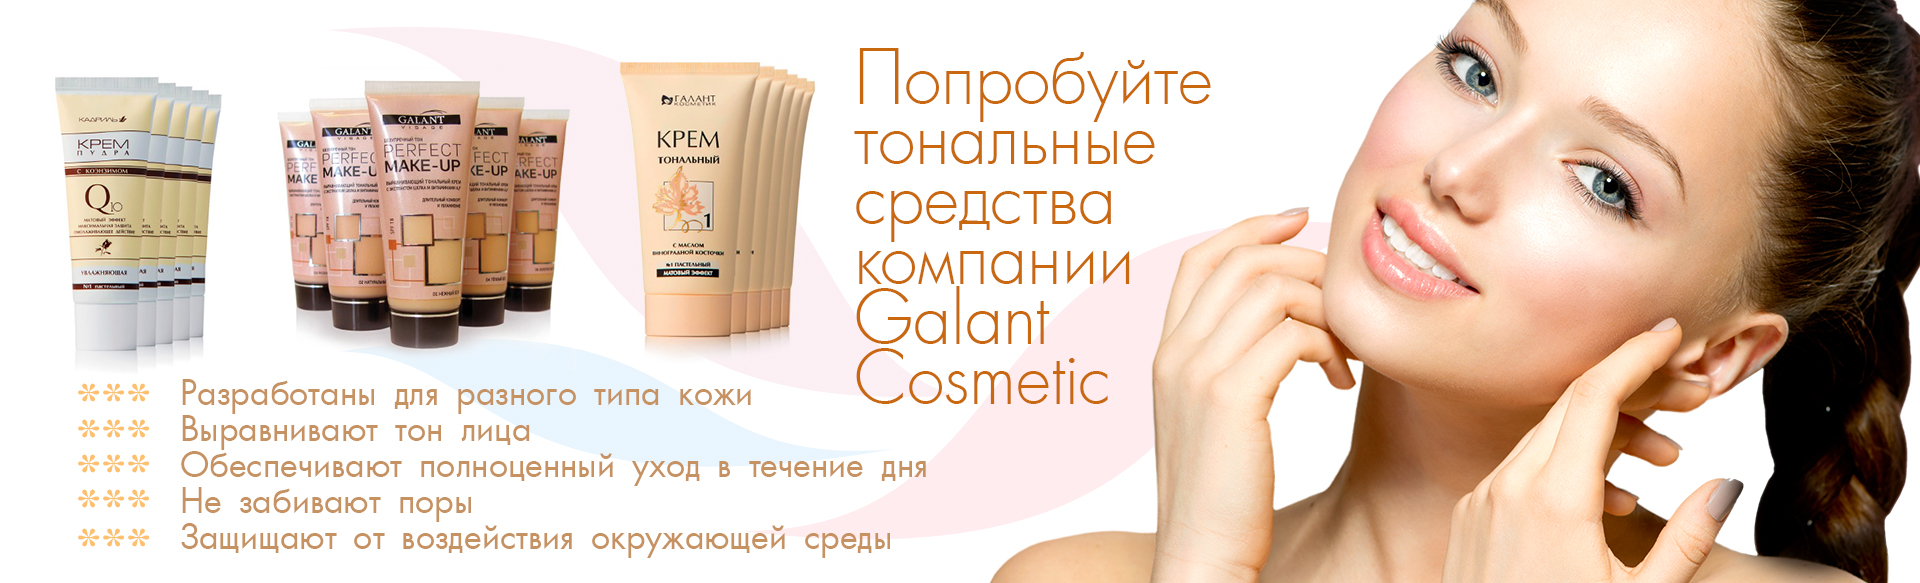 Косметика казахстан онлайн